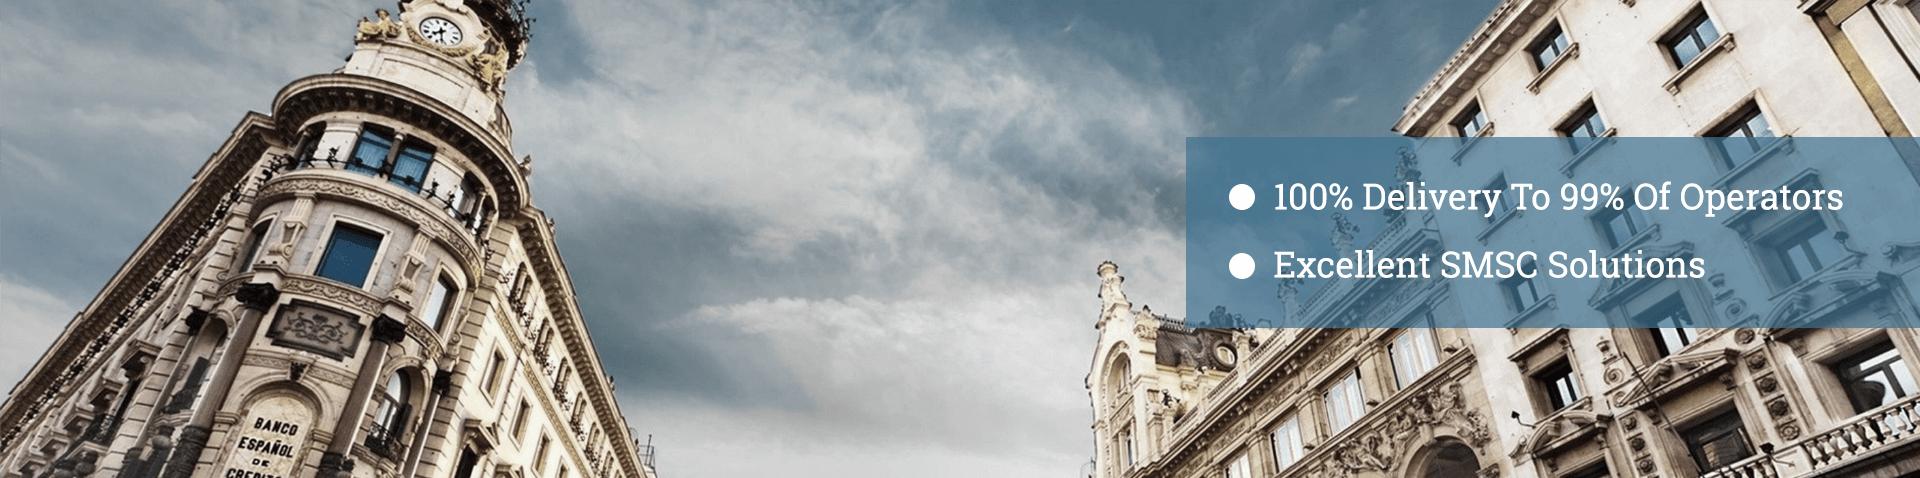 International Bulk SMS Messaging Service Provider - BroadNet